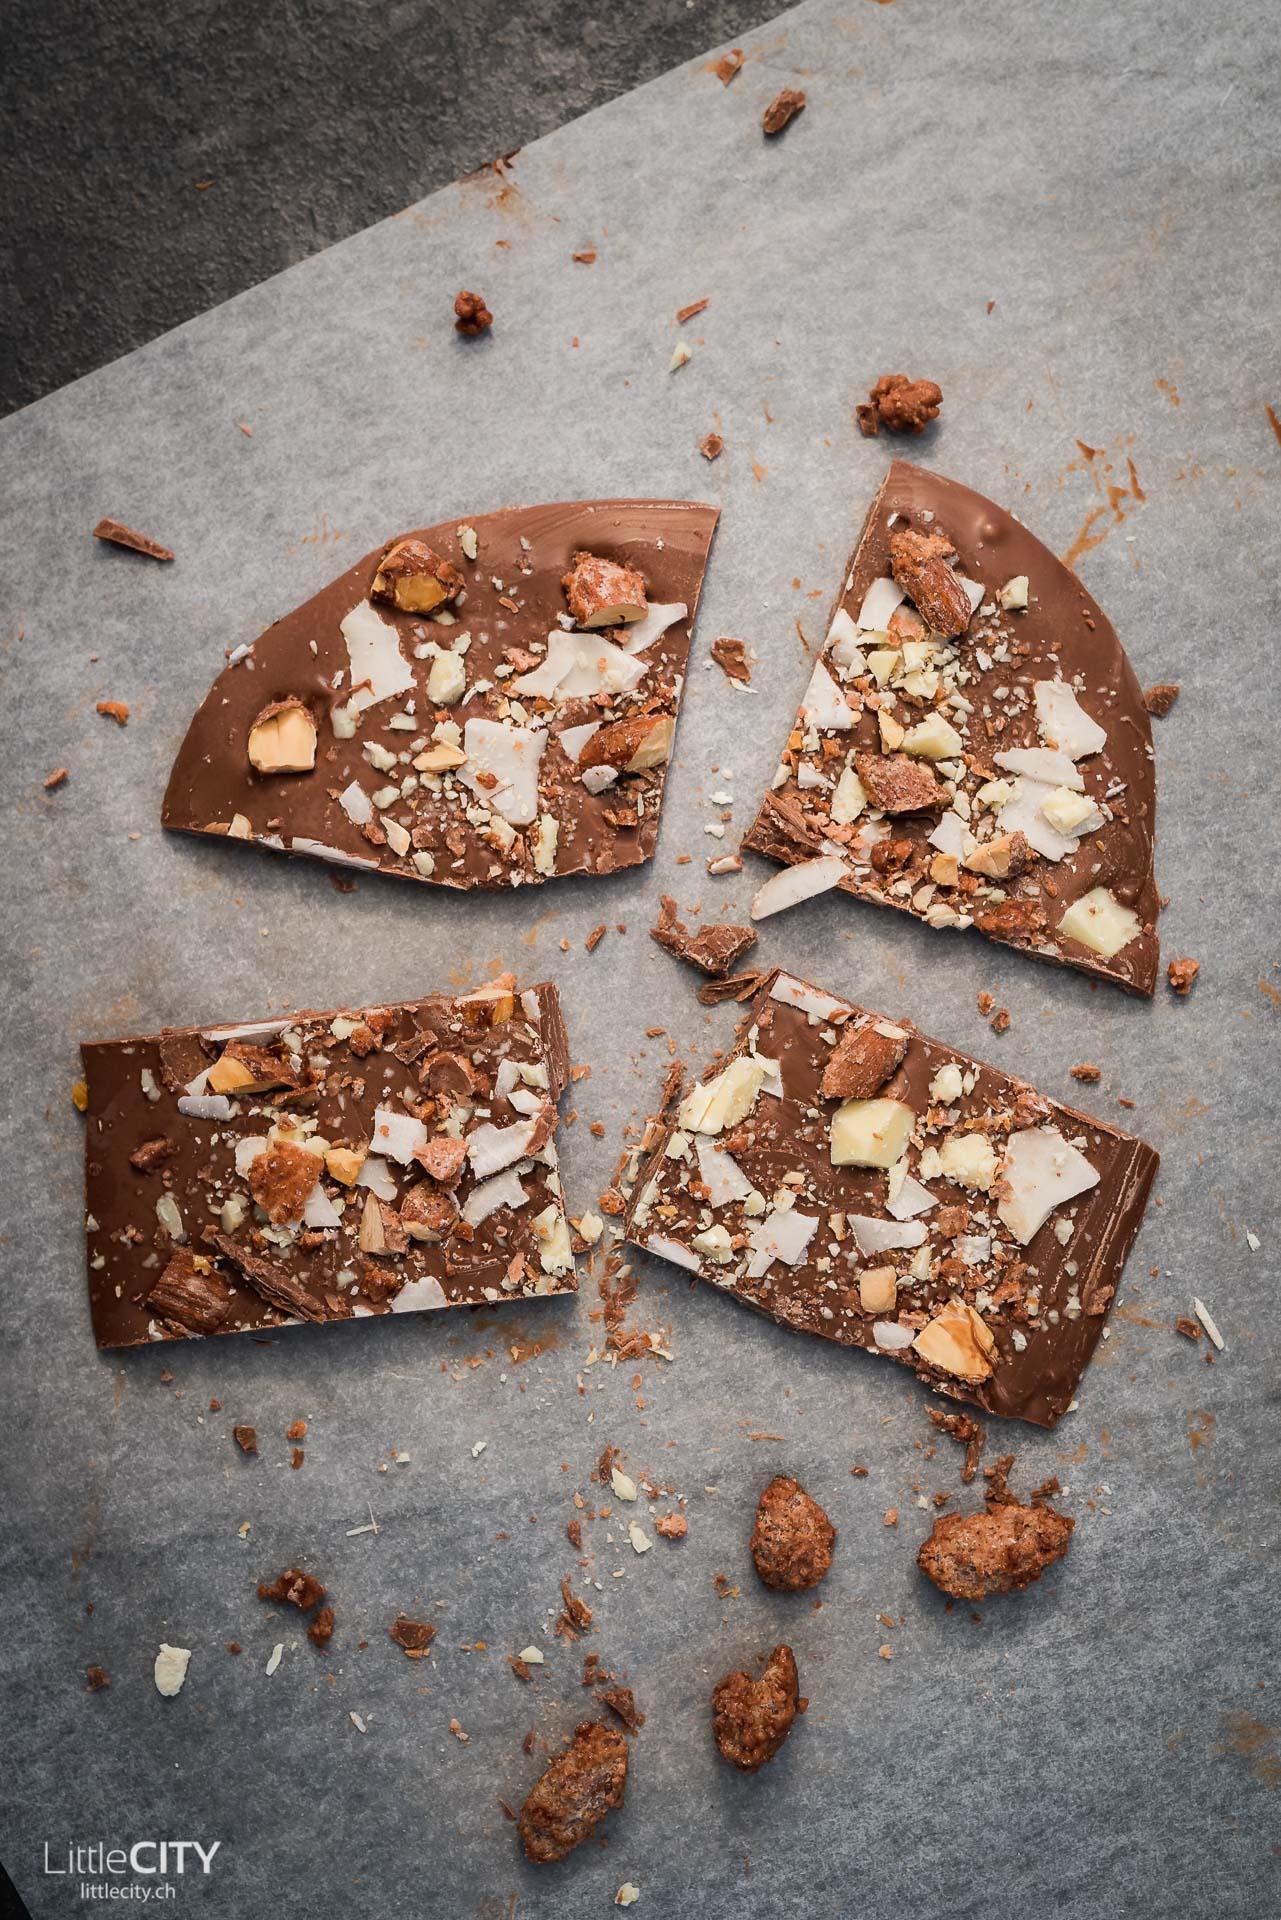 Schokoladen Tafel sellber machen